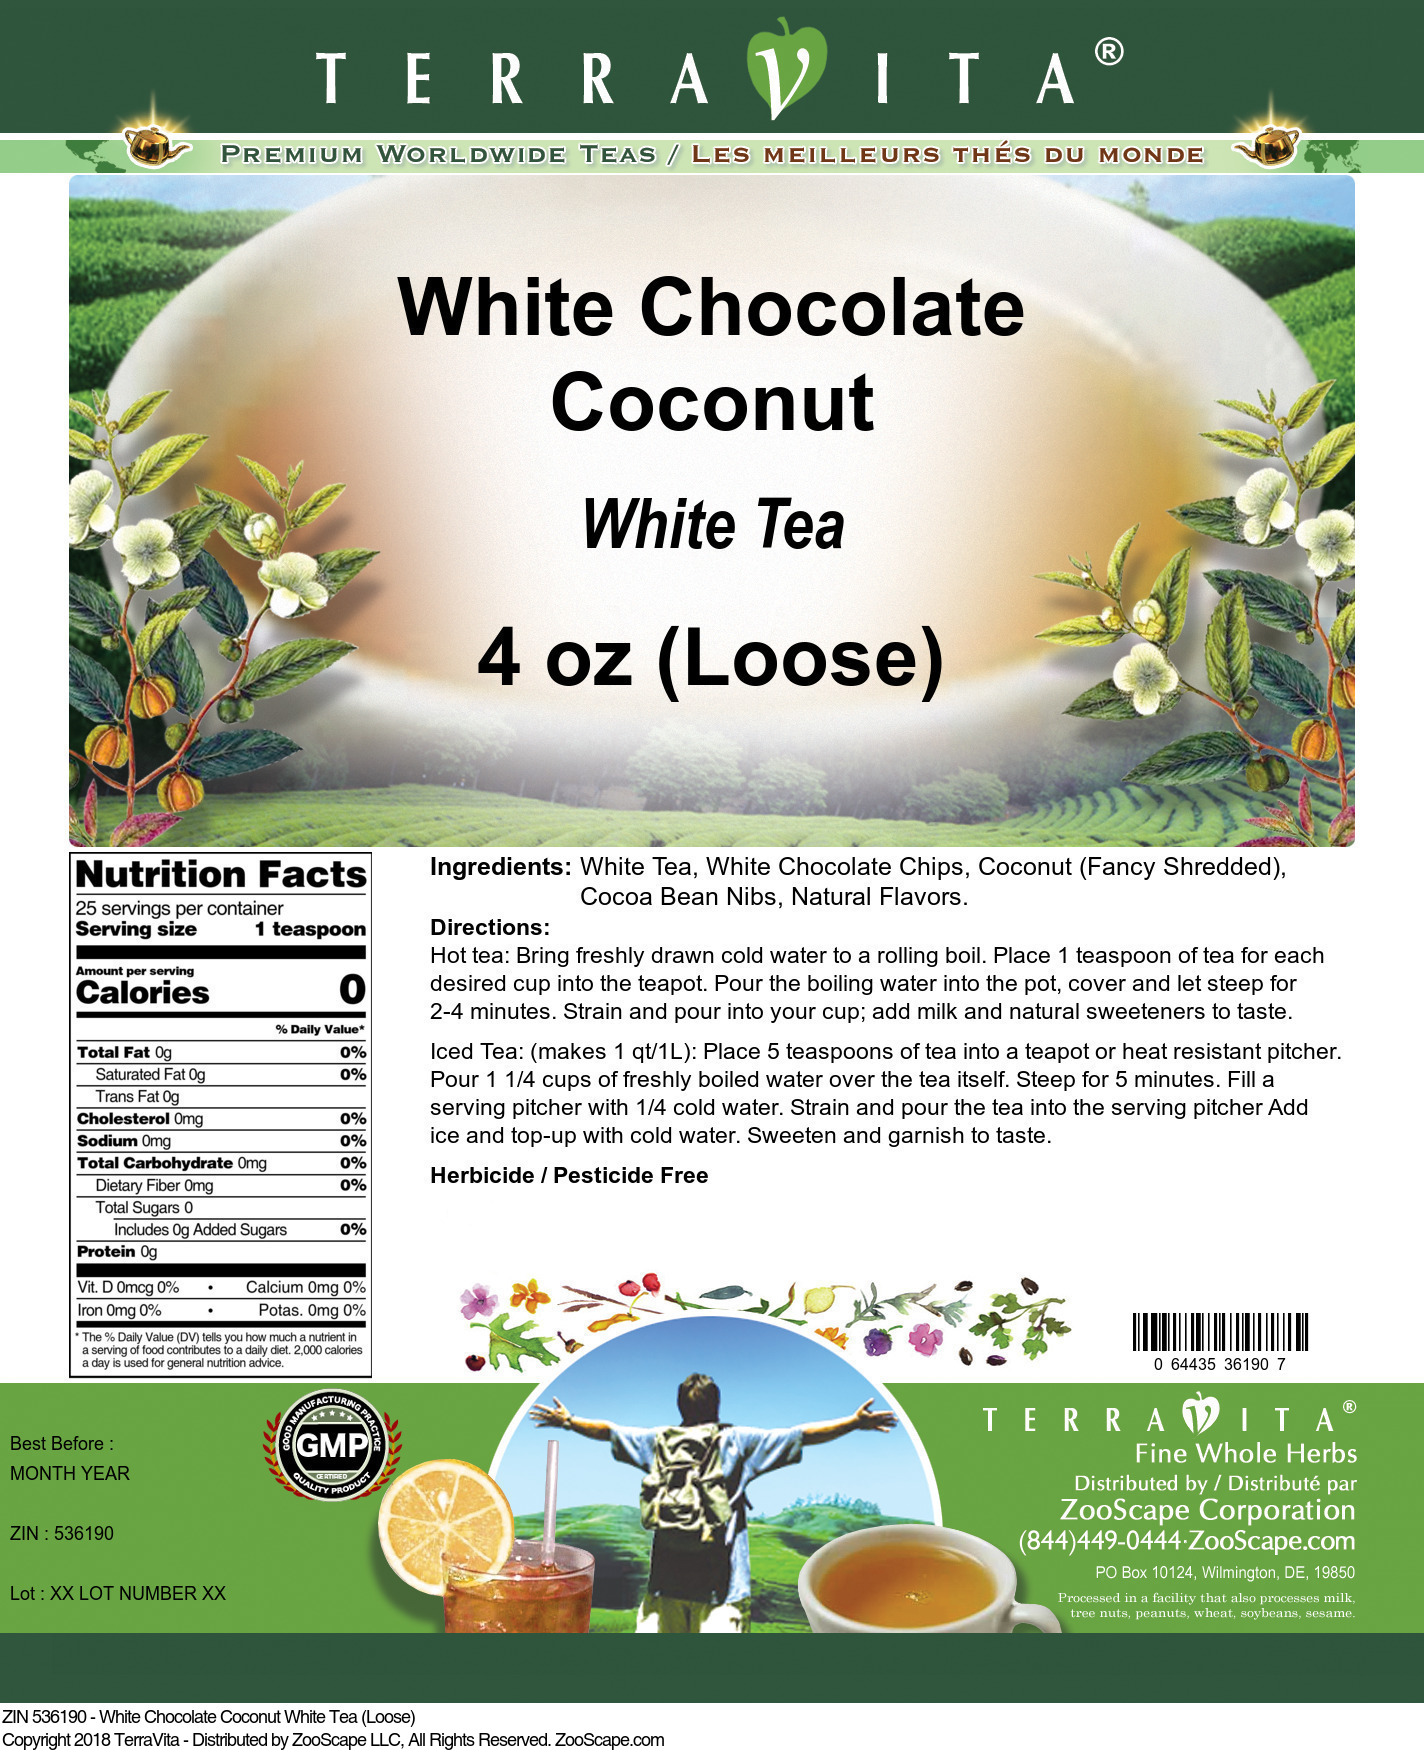 White Chocolate Coconut White Tea (Loose)